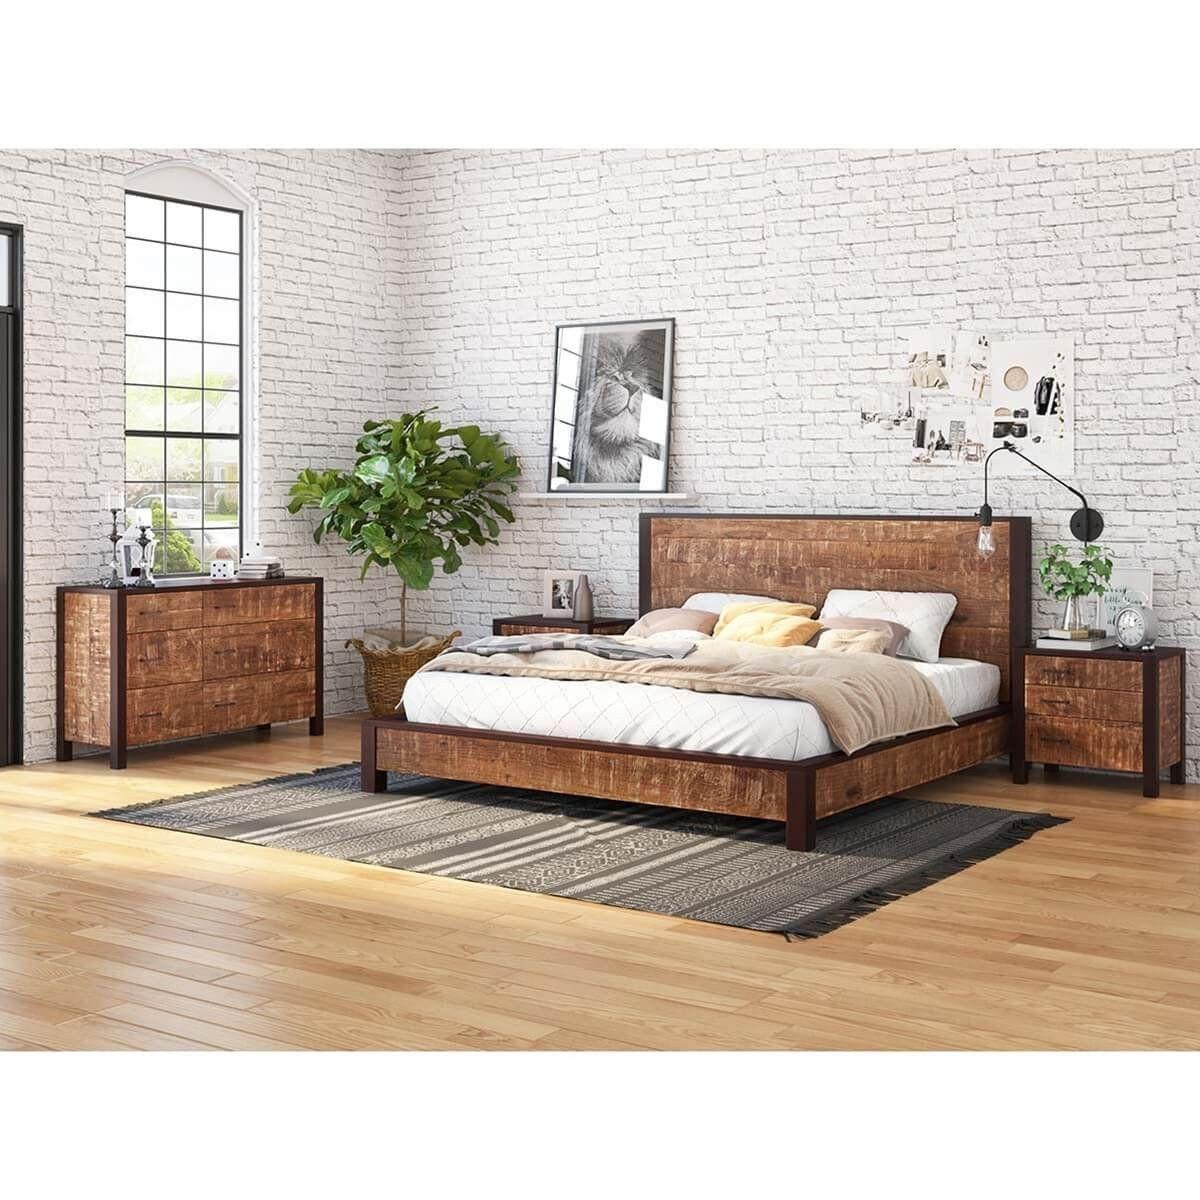 Solid Oak Bedroom Set New Orleans Solid Wood 4 Piece Bedroom Set Wood Bedroom Sets Bedroom Set Oak Bedroom